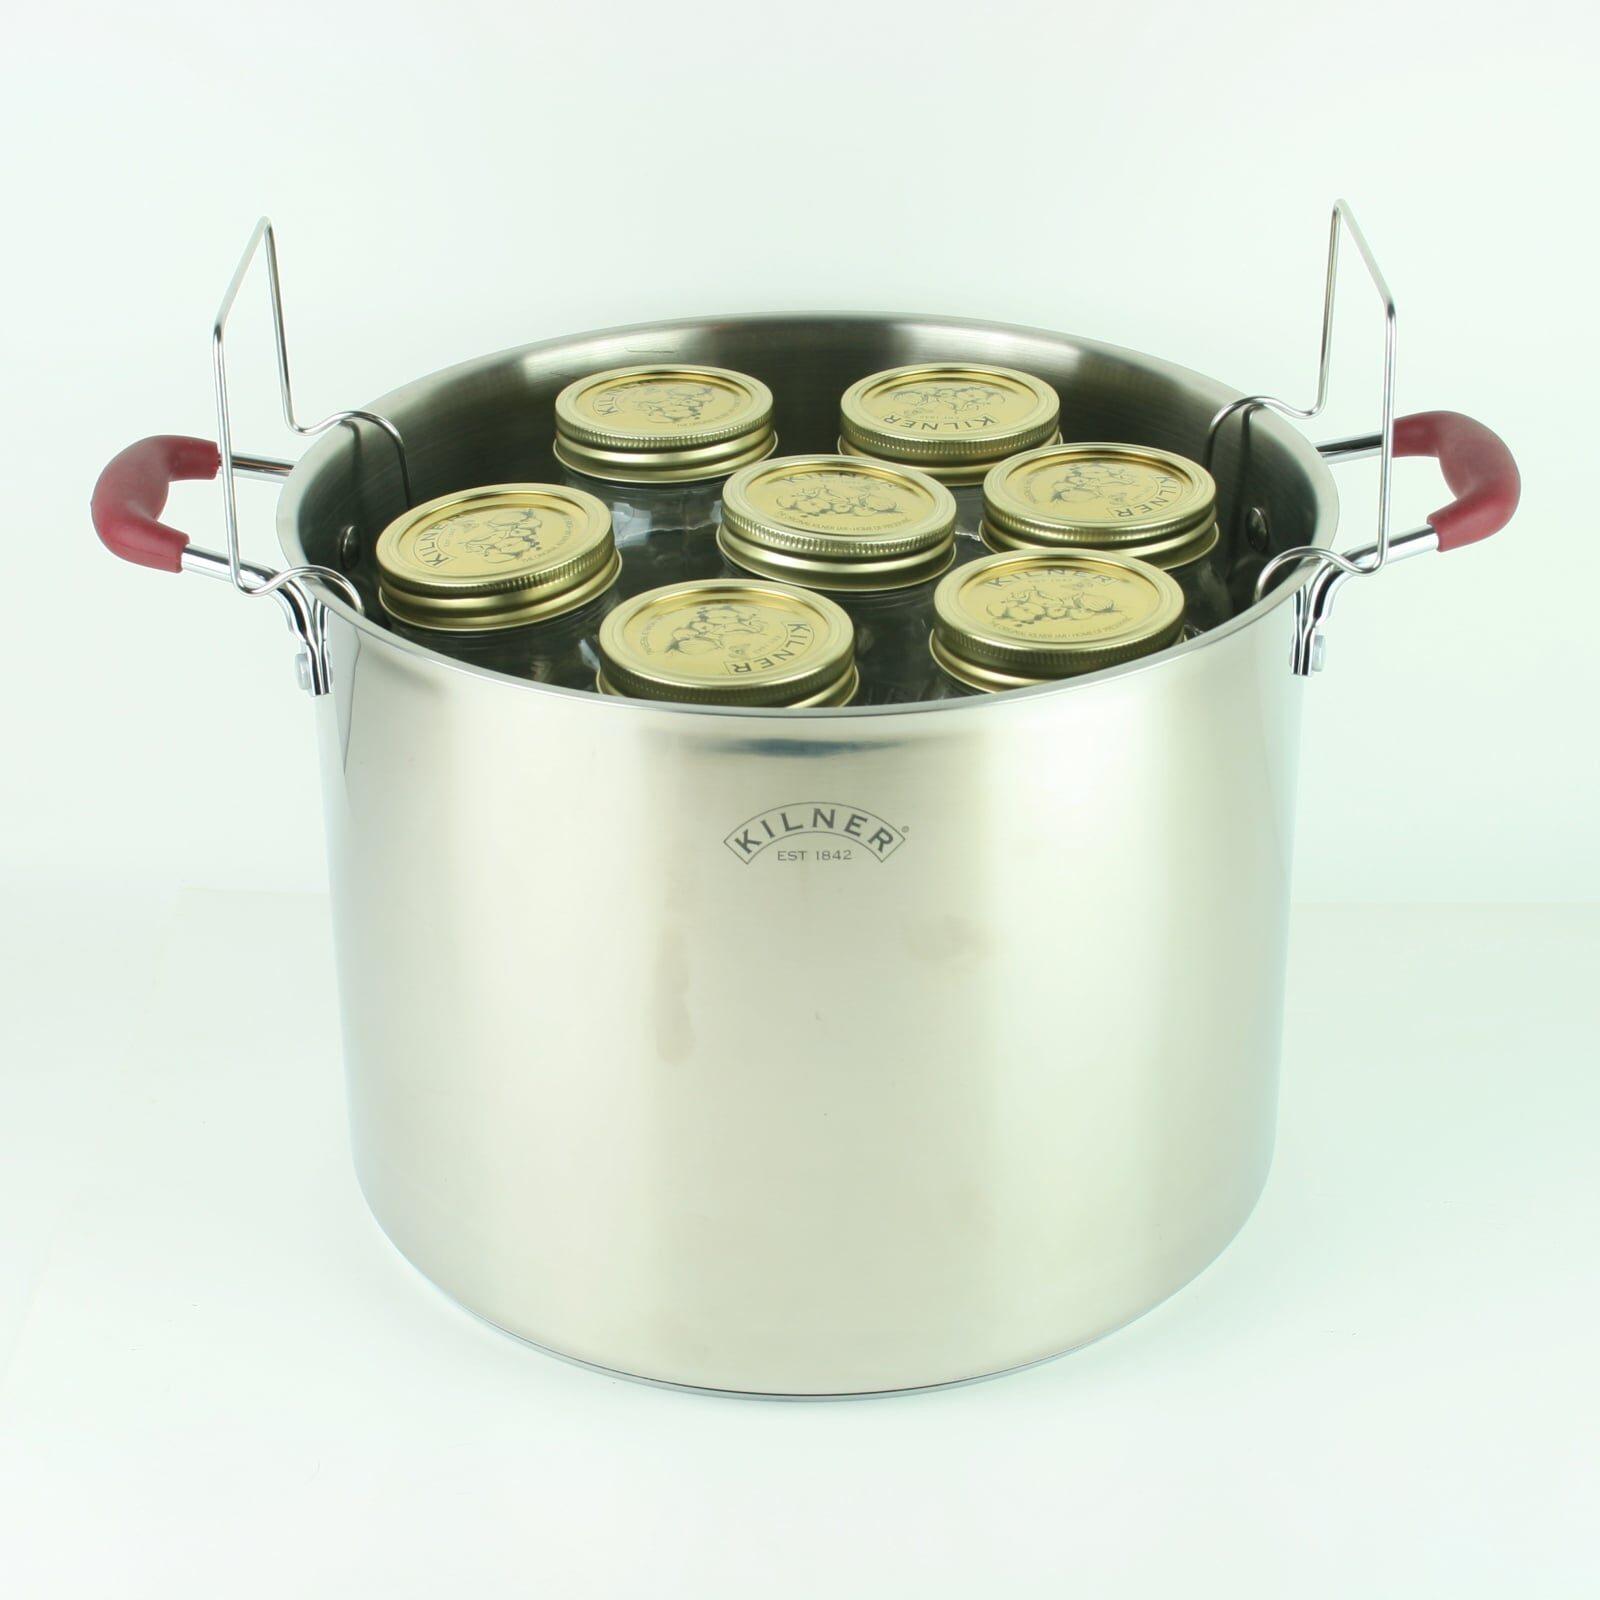 Kilner Canning Pan Canner Set with Rack for 7 500ml Preserve Jars